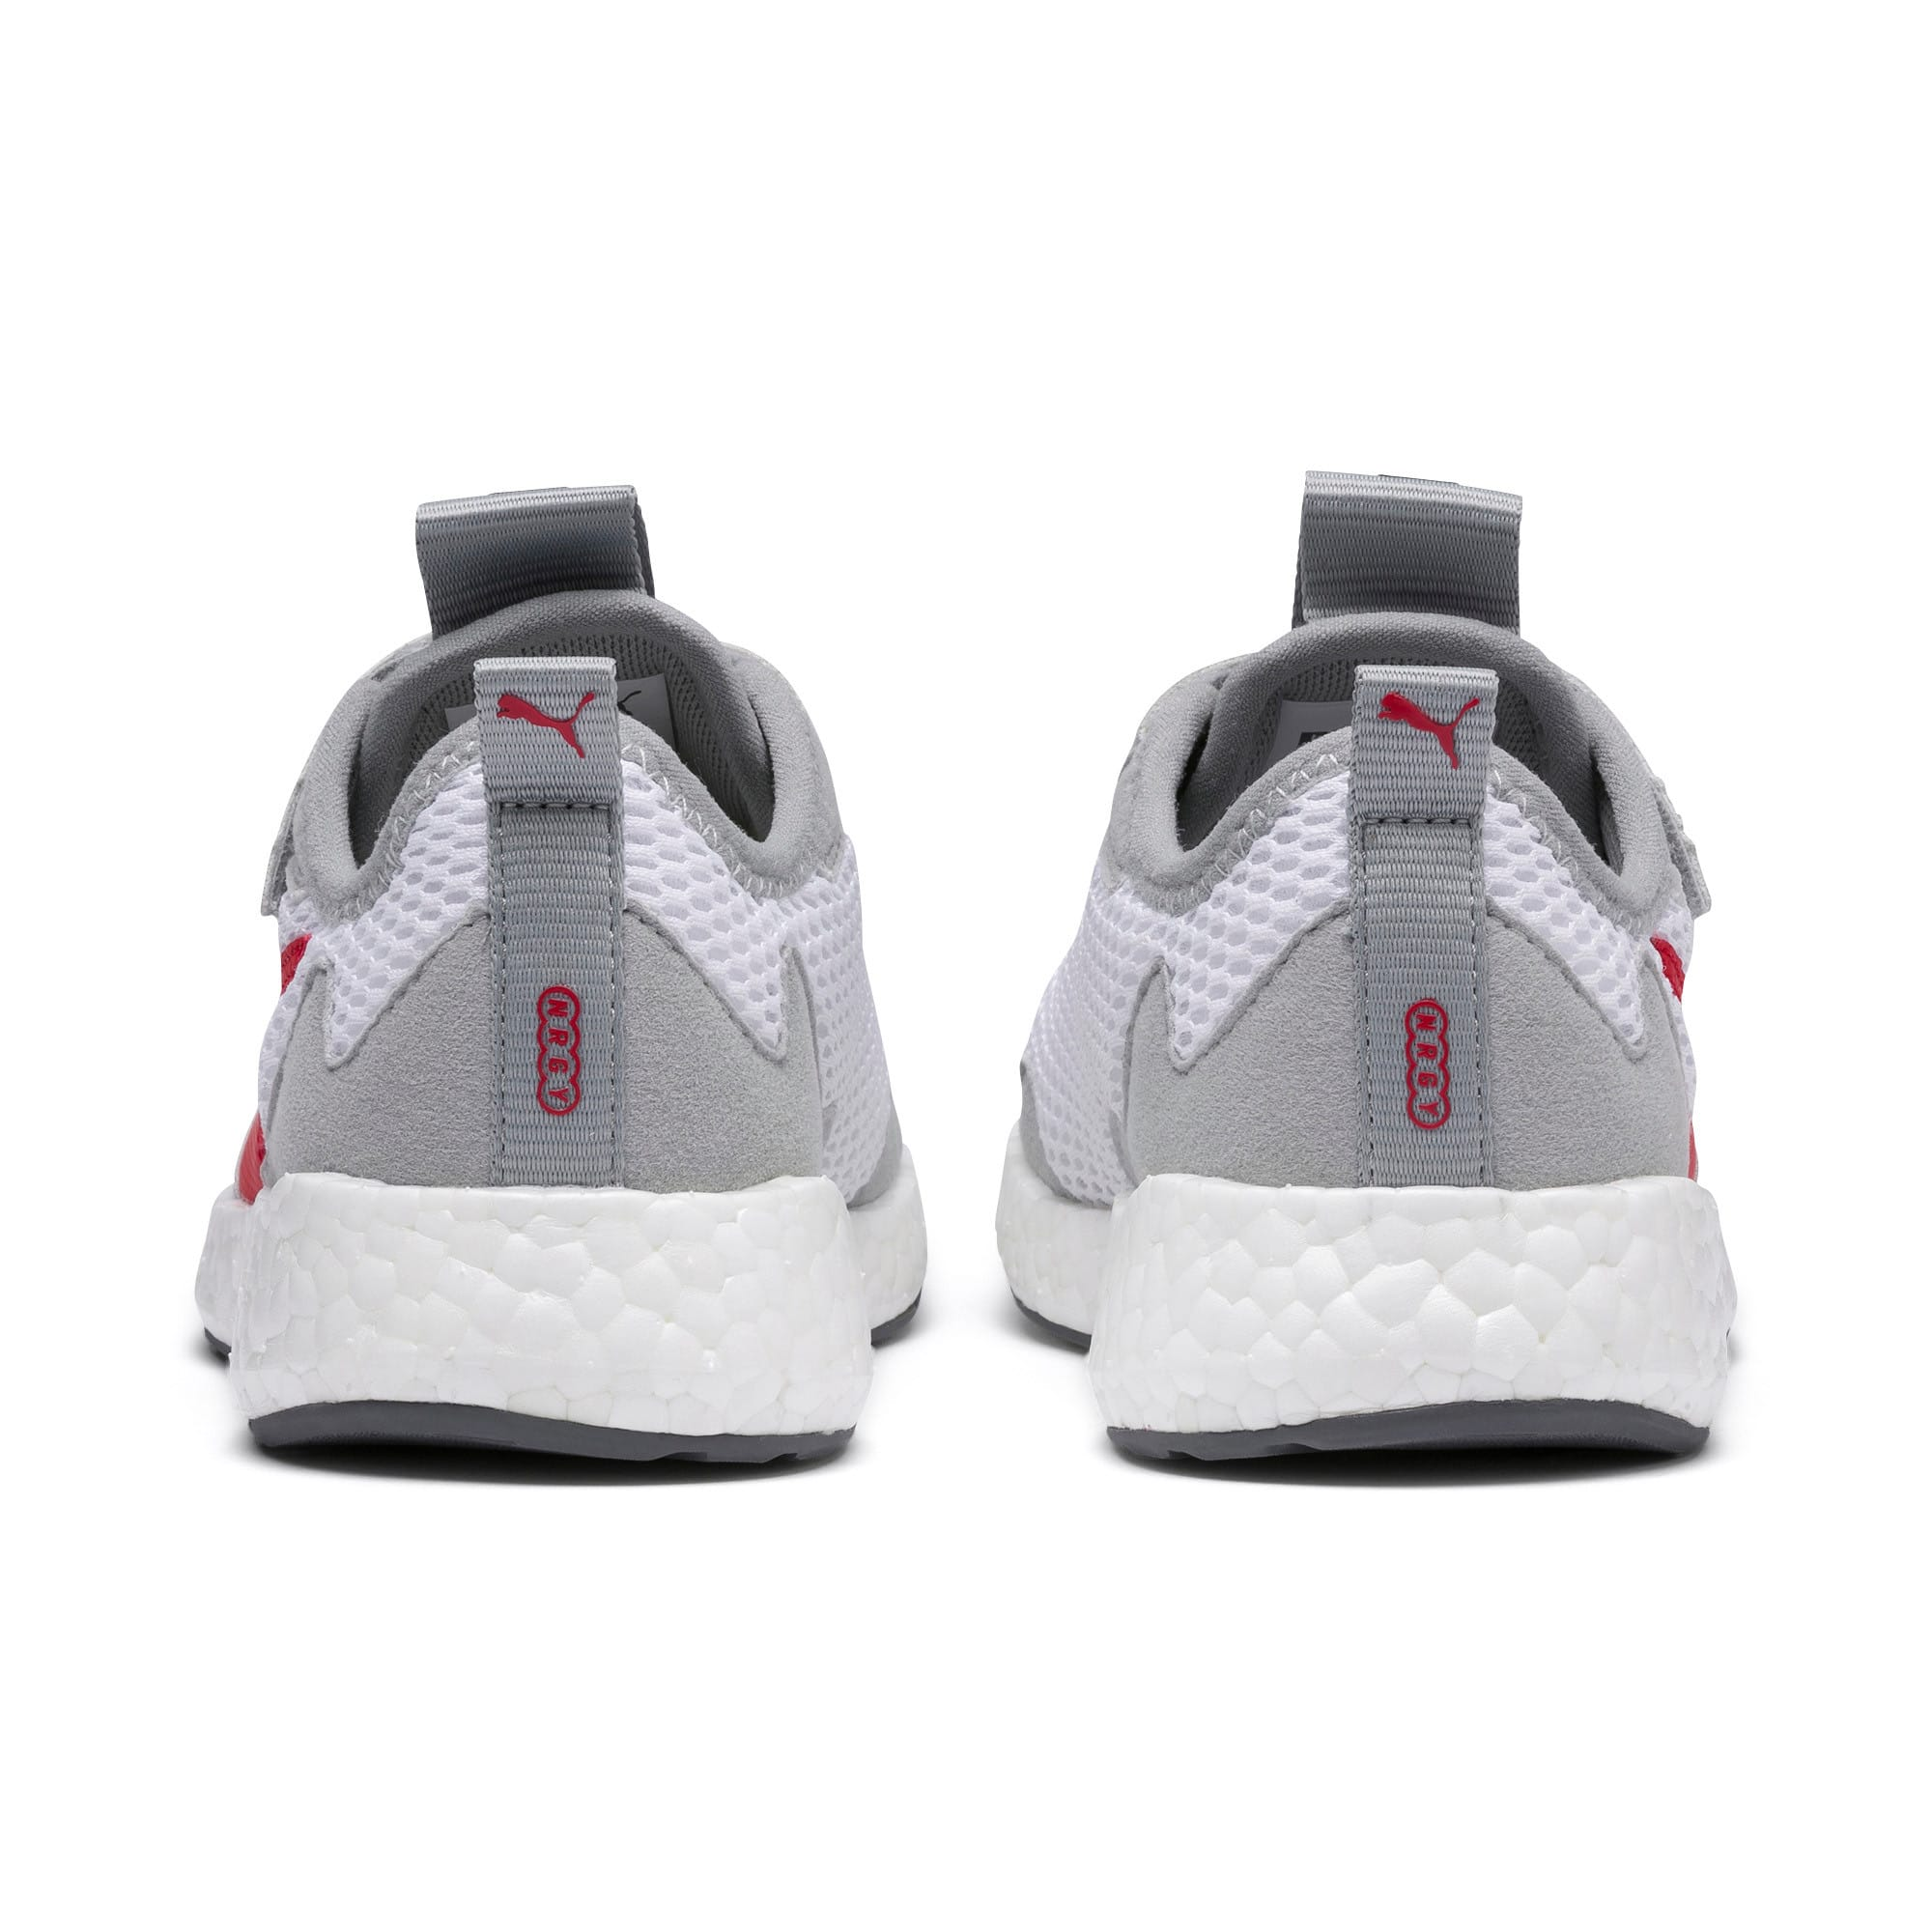 Thumbnail 3 of NRGY Neko Skim AC Shoes PS, White-H Rise-CASTLEROCK-Red, medium